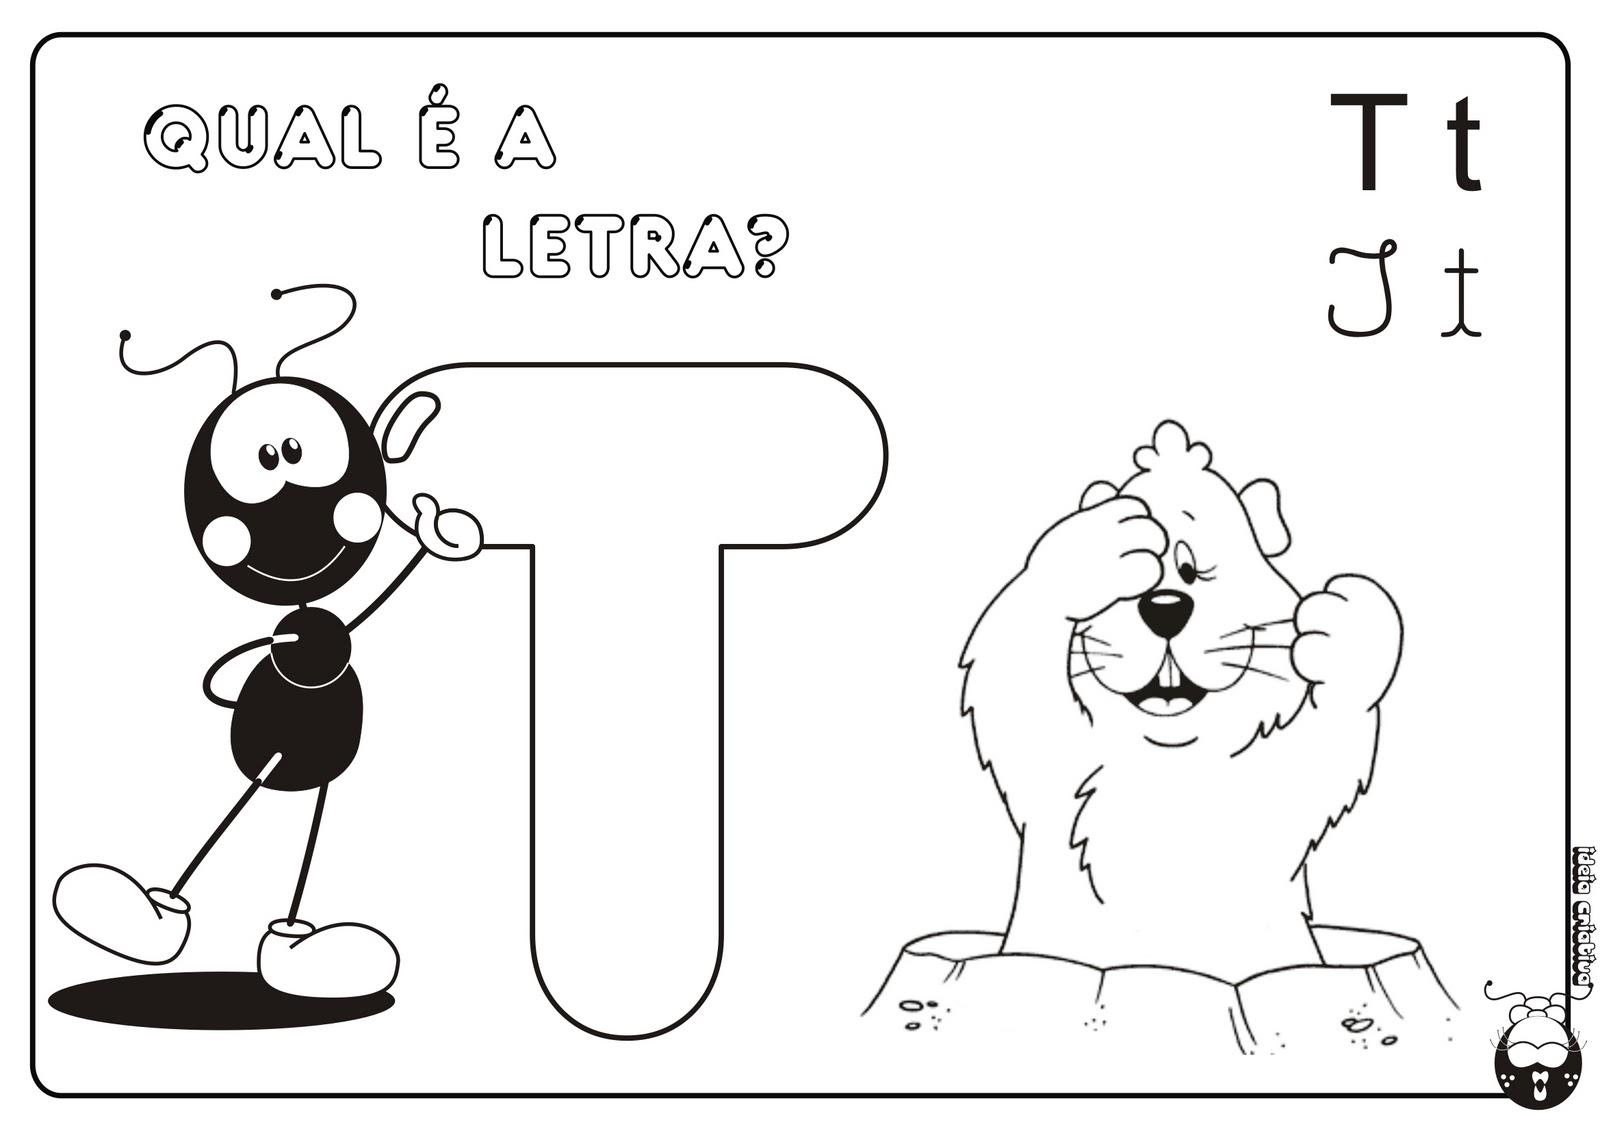 Alfabeto Smilinguido 4 tipos de letra para Baixar Grátis Letra t